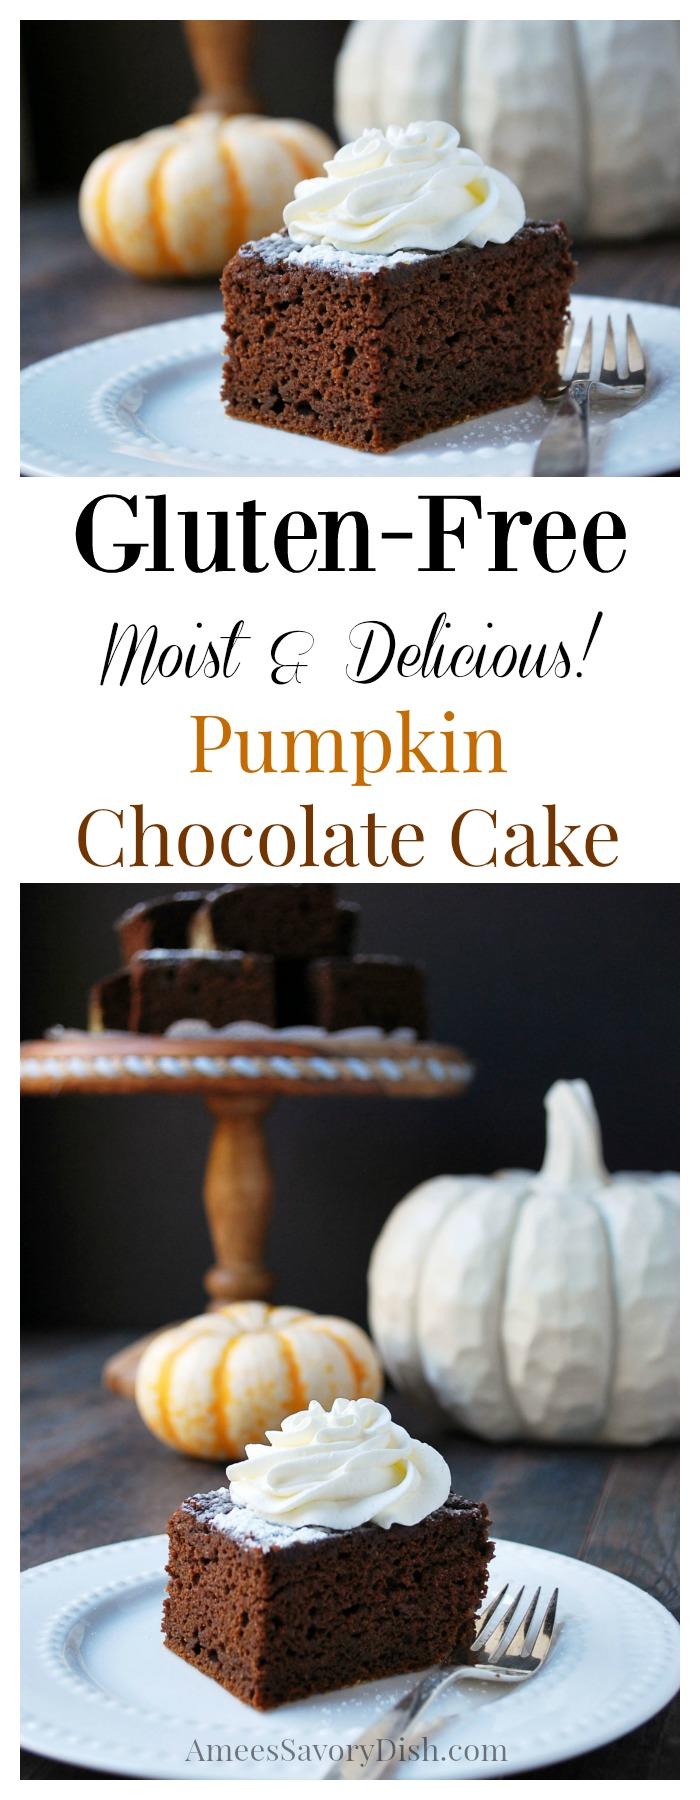 Gluten Free Pumpkin Chocolate Cake